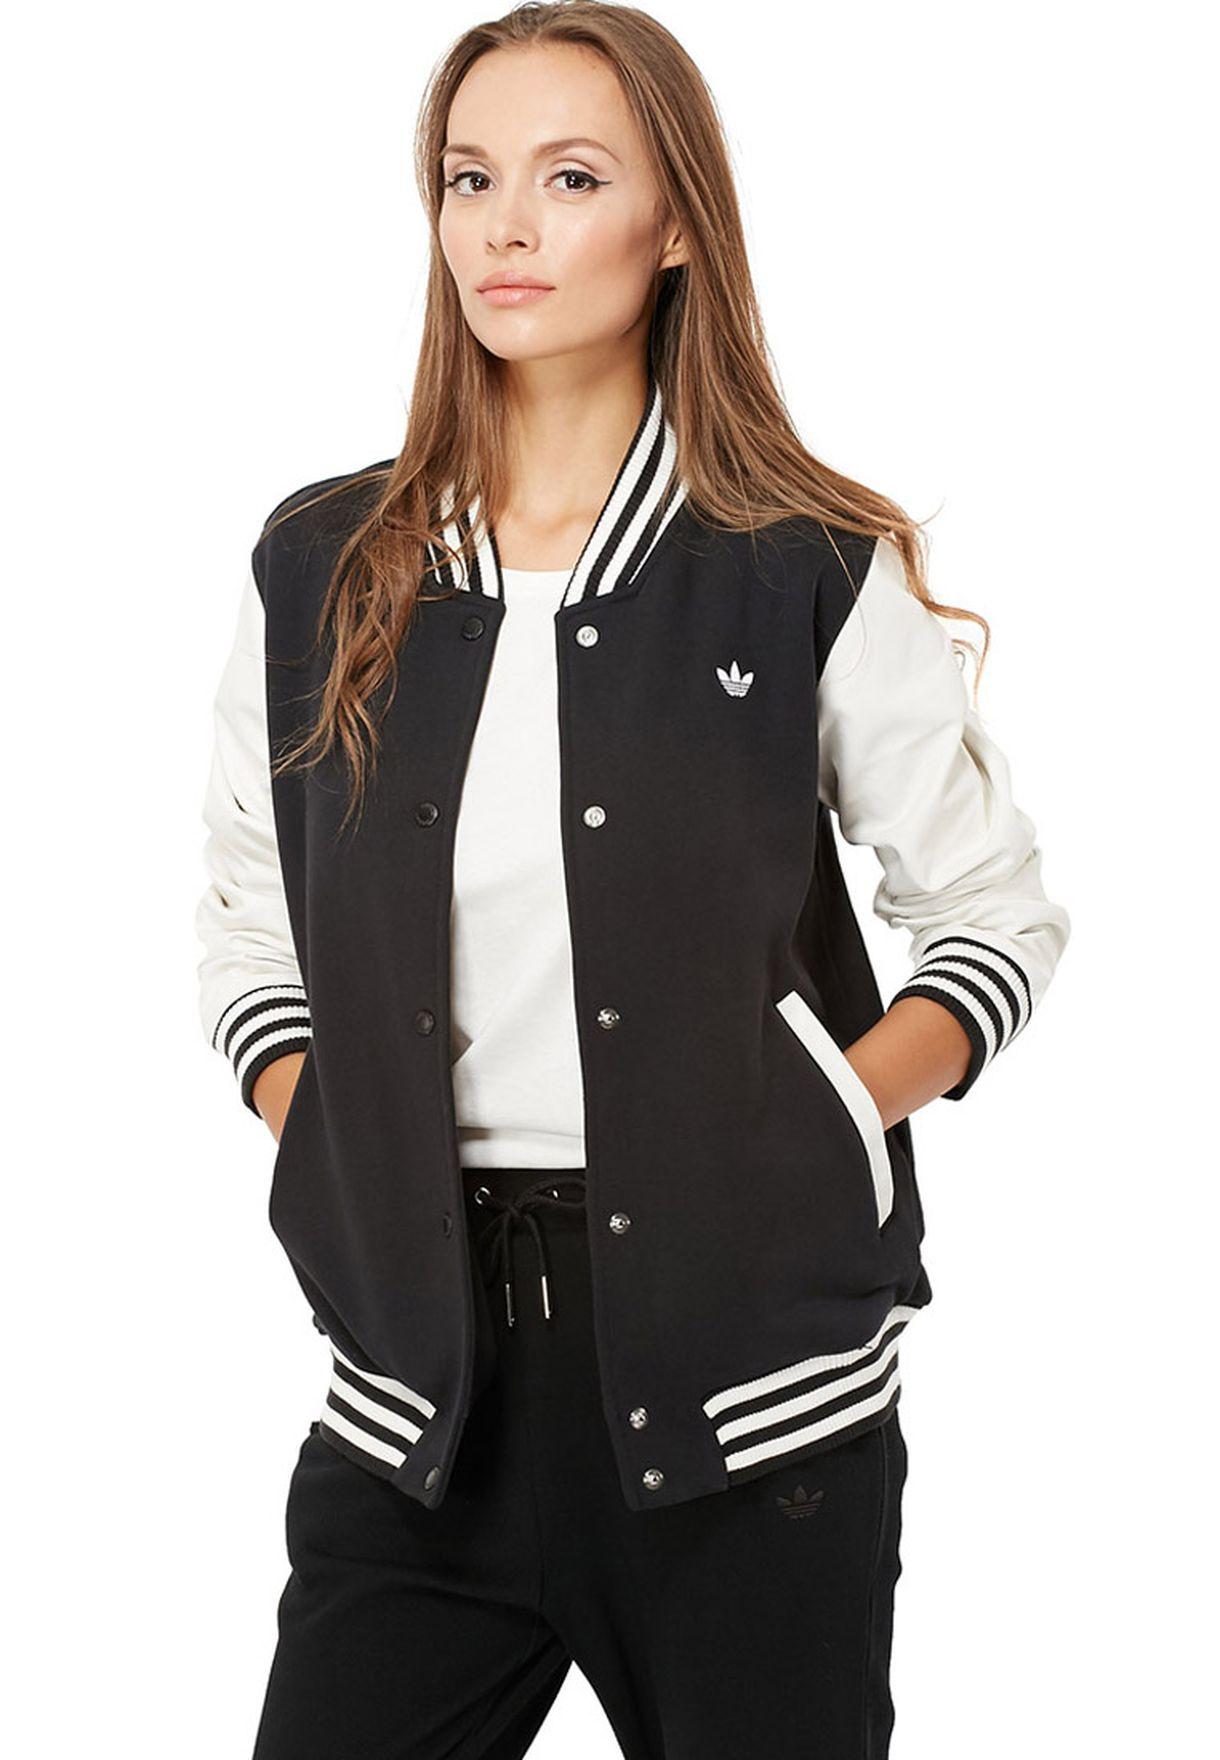 adidas varsity jacket womens